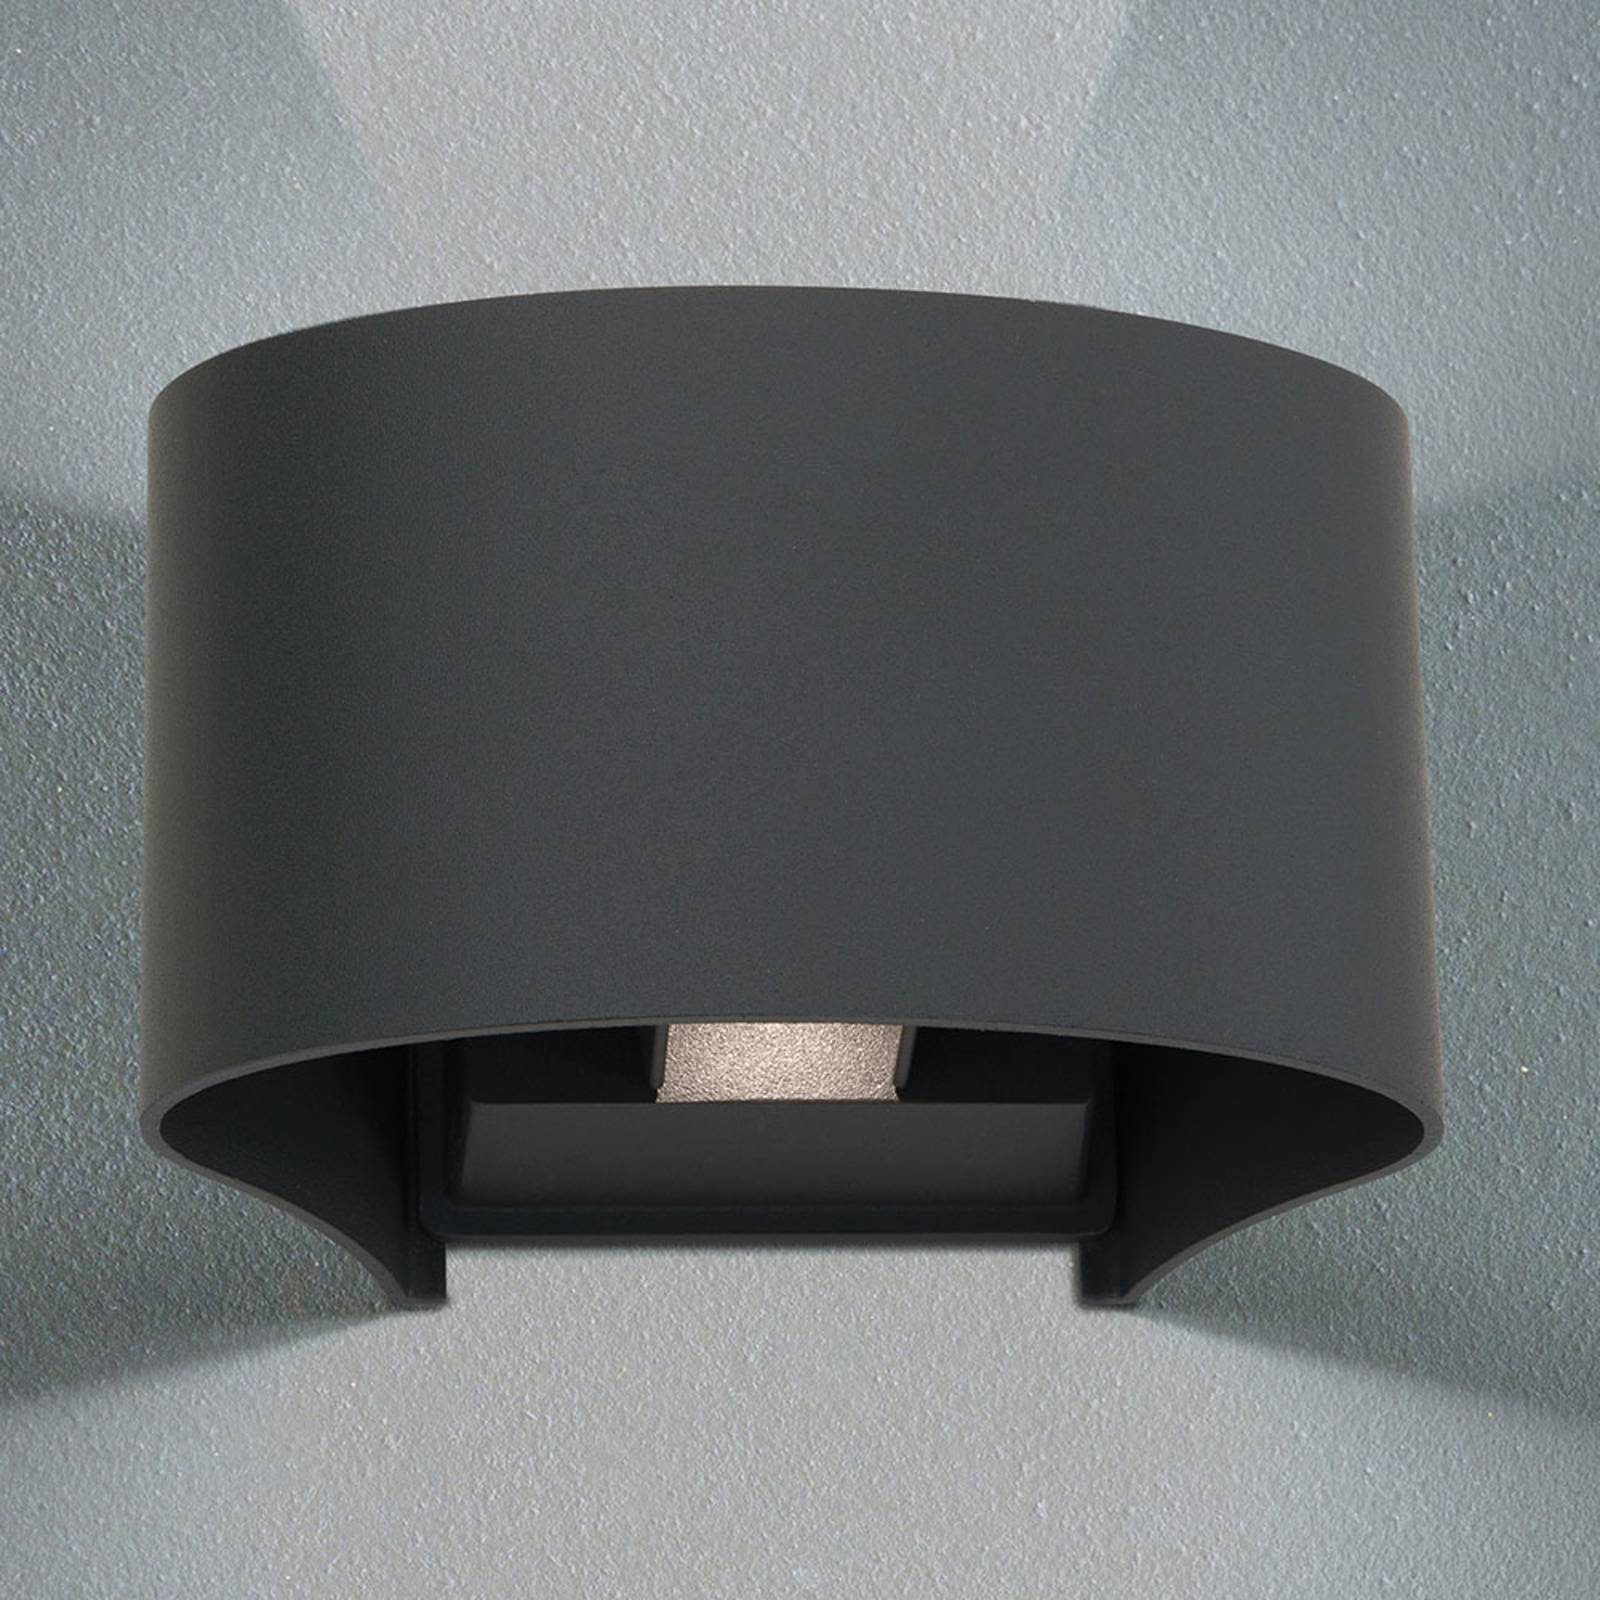 LED-ulkoseinälamppu Greta, up/down, antrasiitti